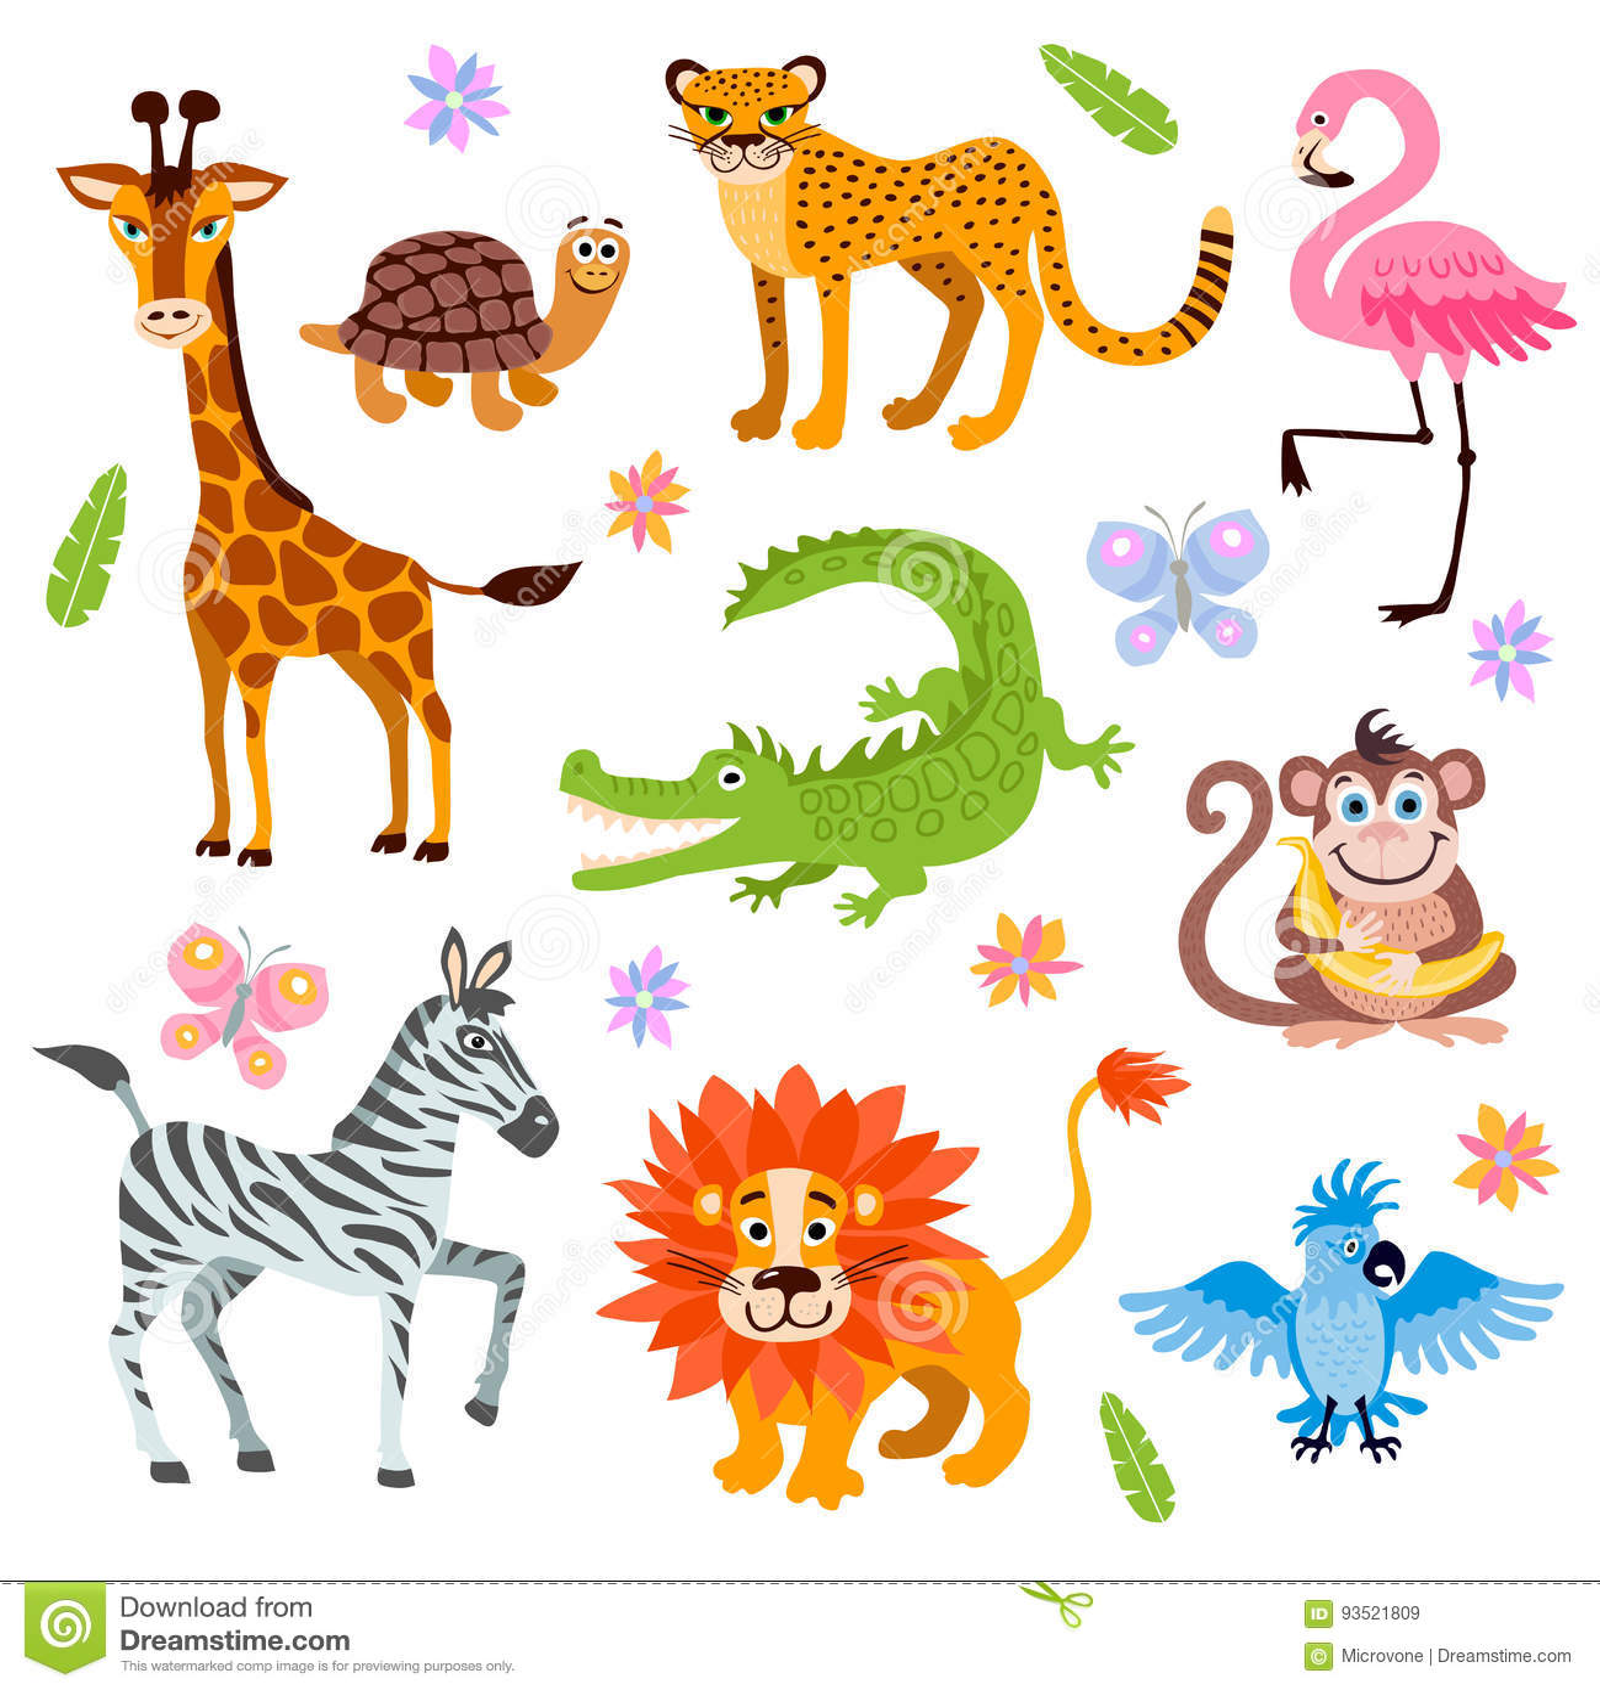 Cute Jungle And Safari Animals Vector Set For Kids Book